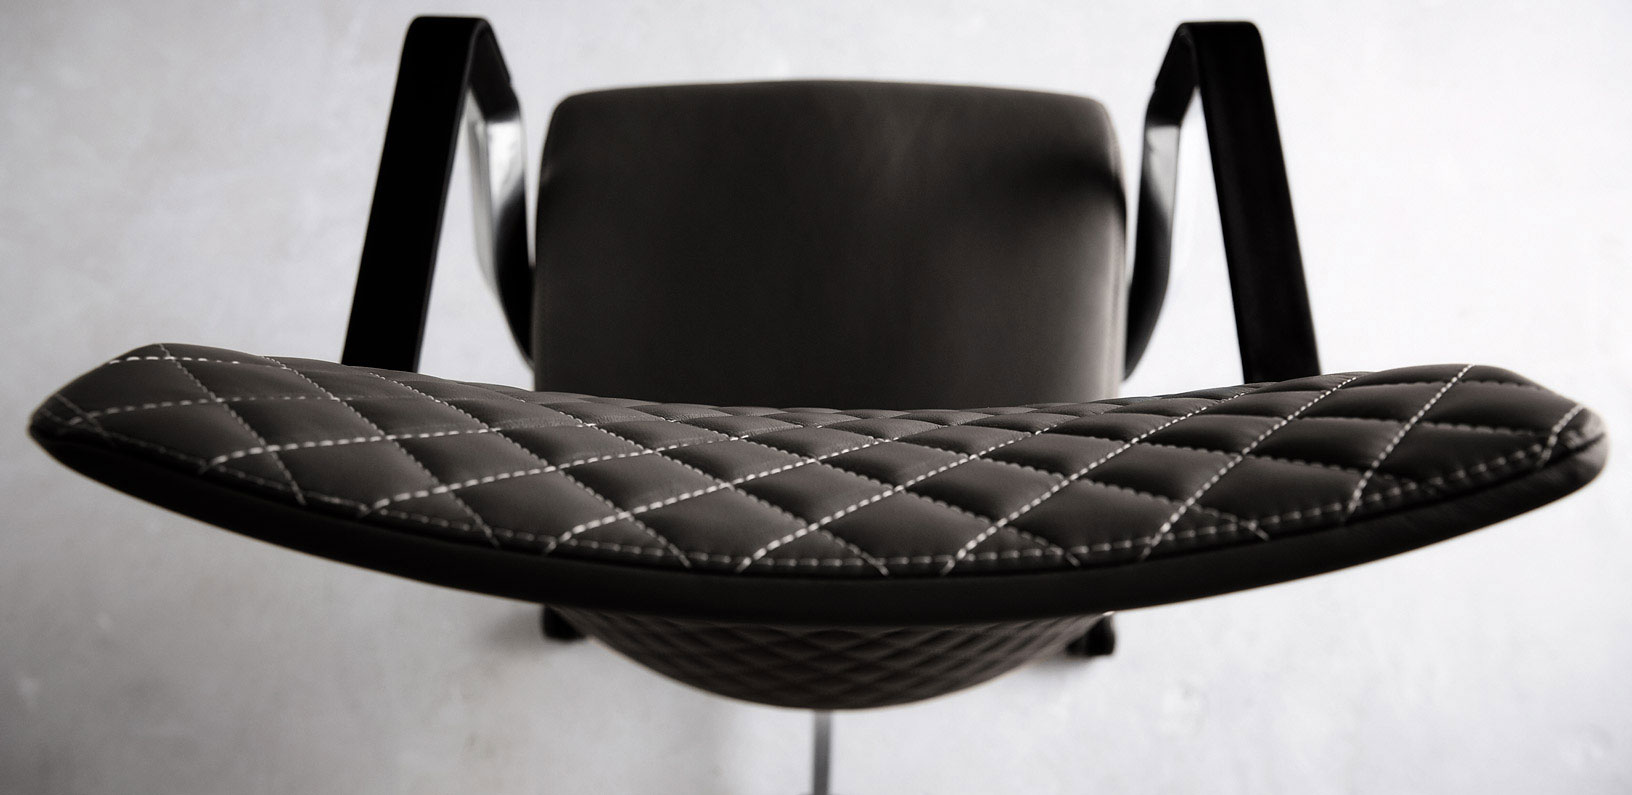 Seating: Via Proform